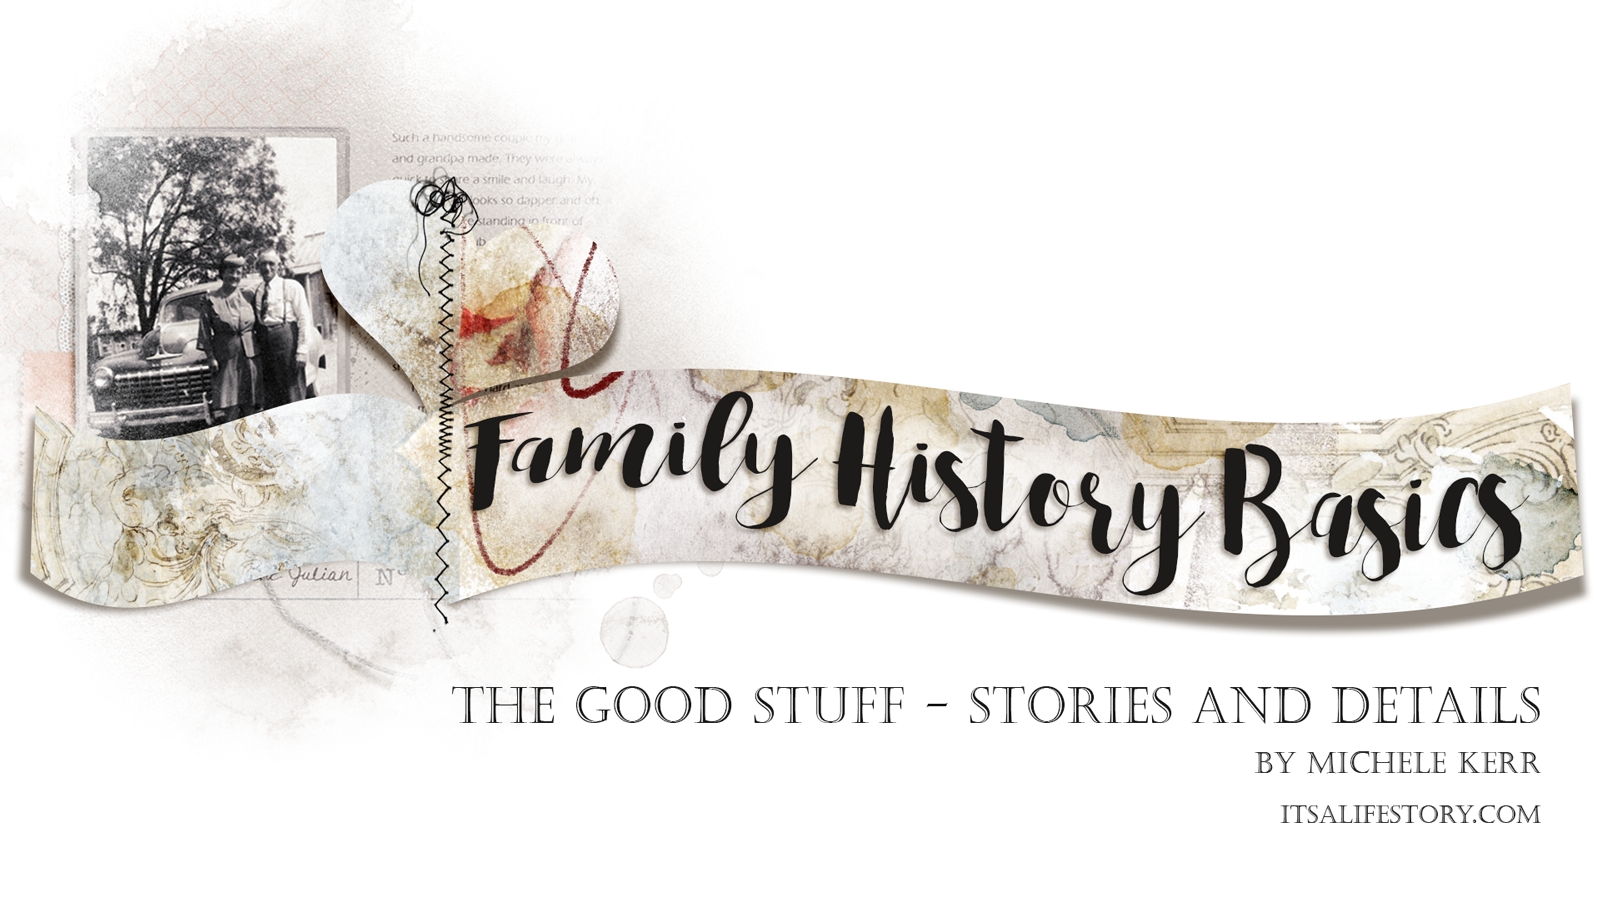 ItsALifeStory.com - FAMILY HISTORY BASICS _ The Good Stuff - Stories and Details